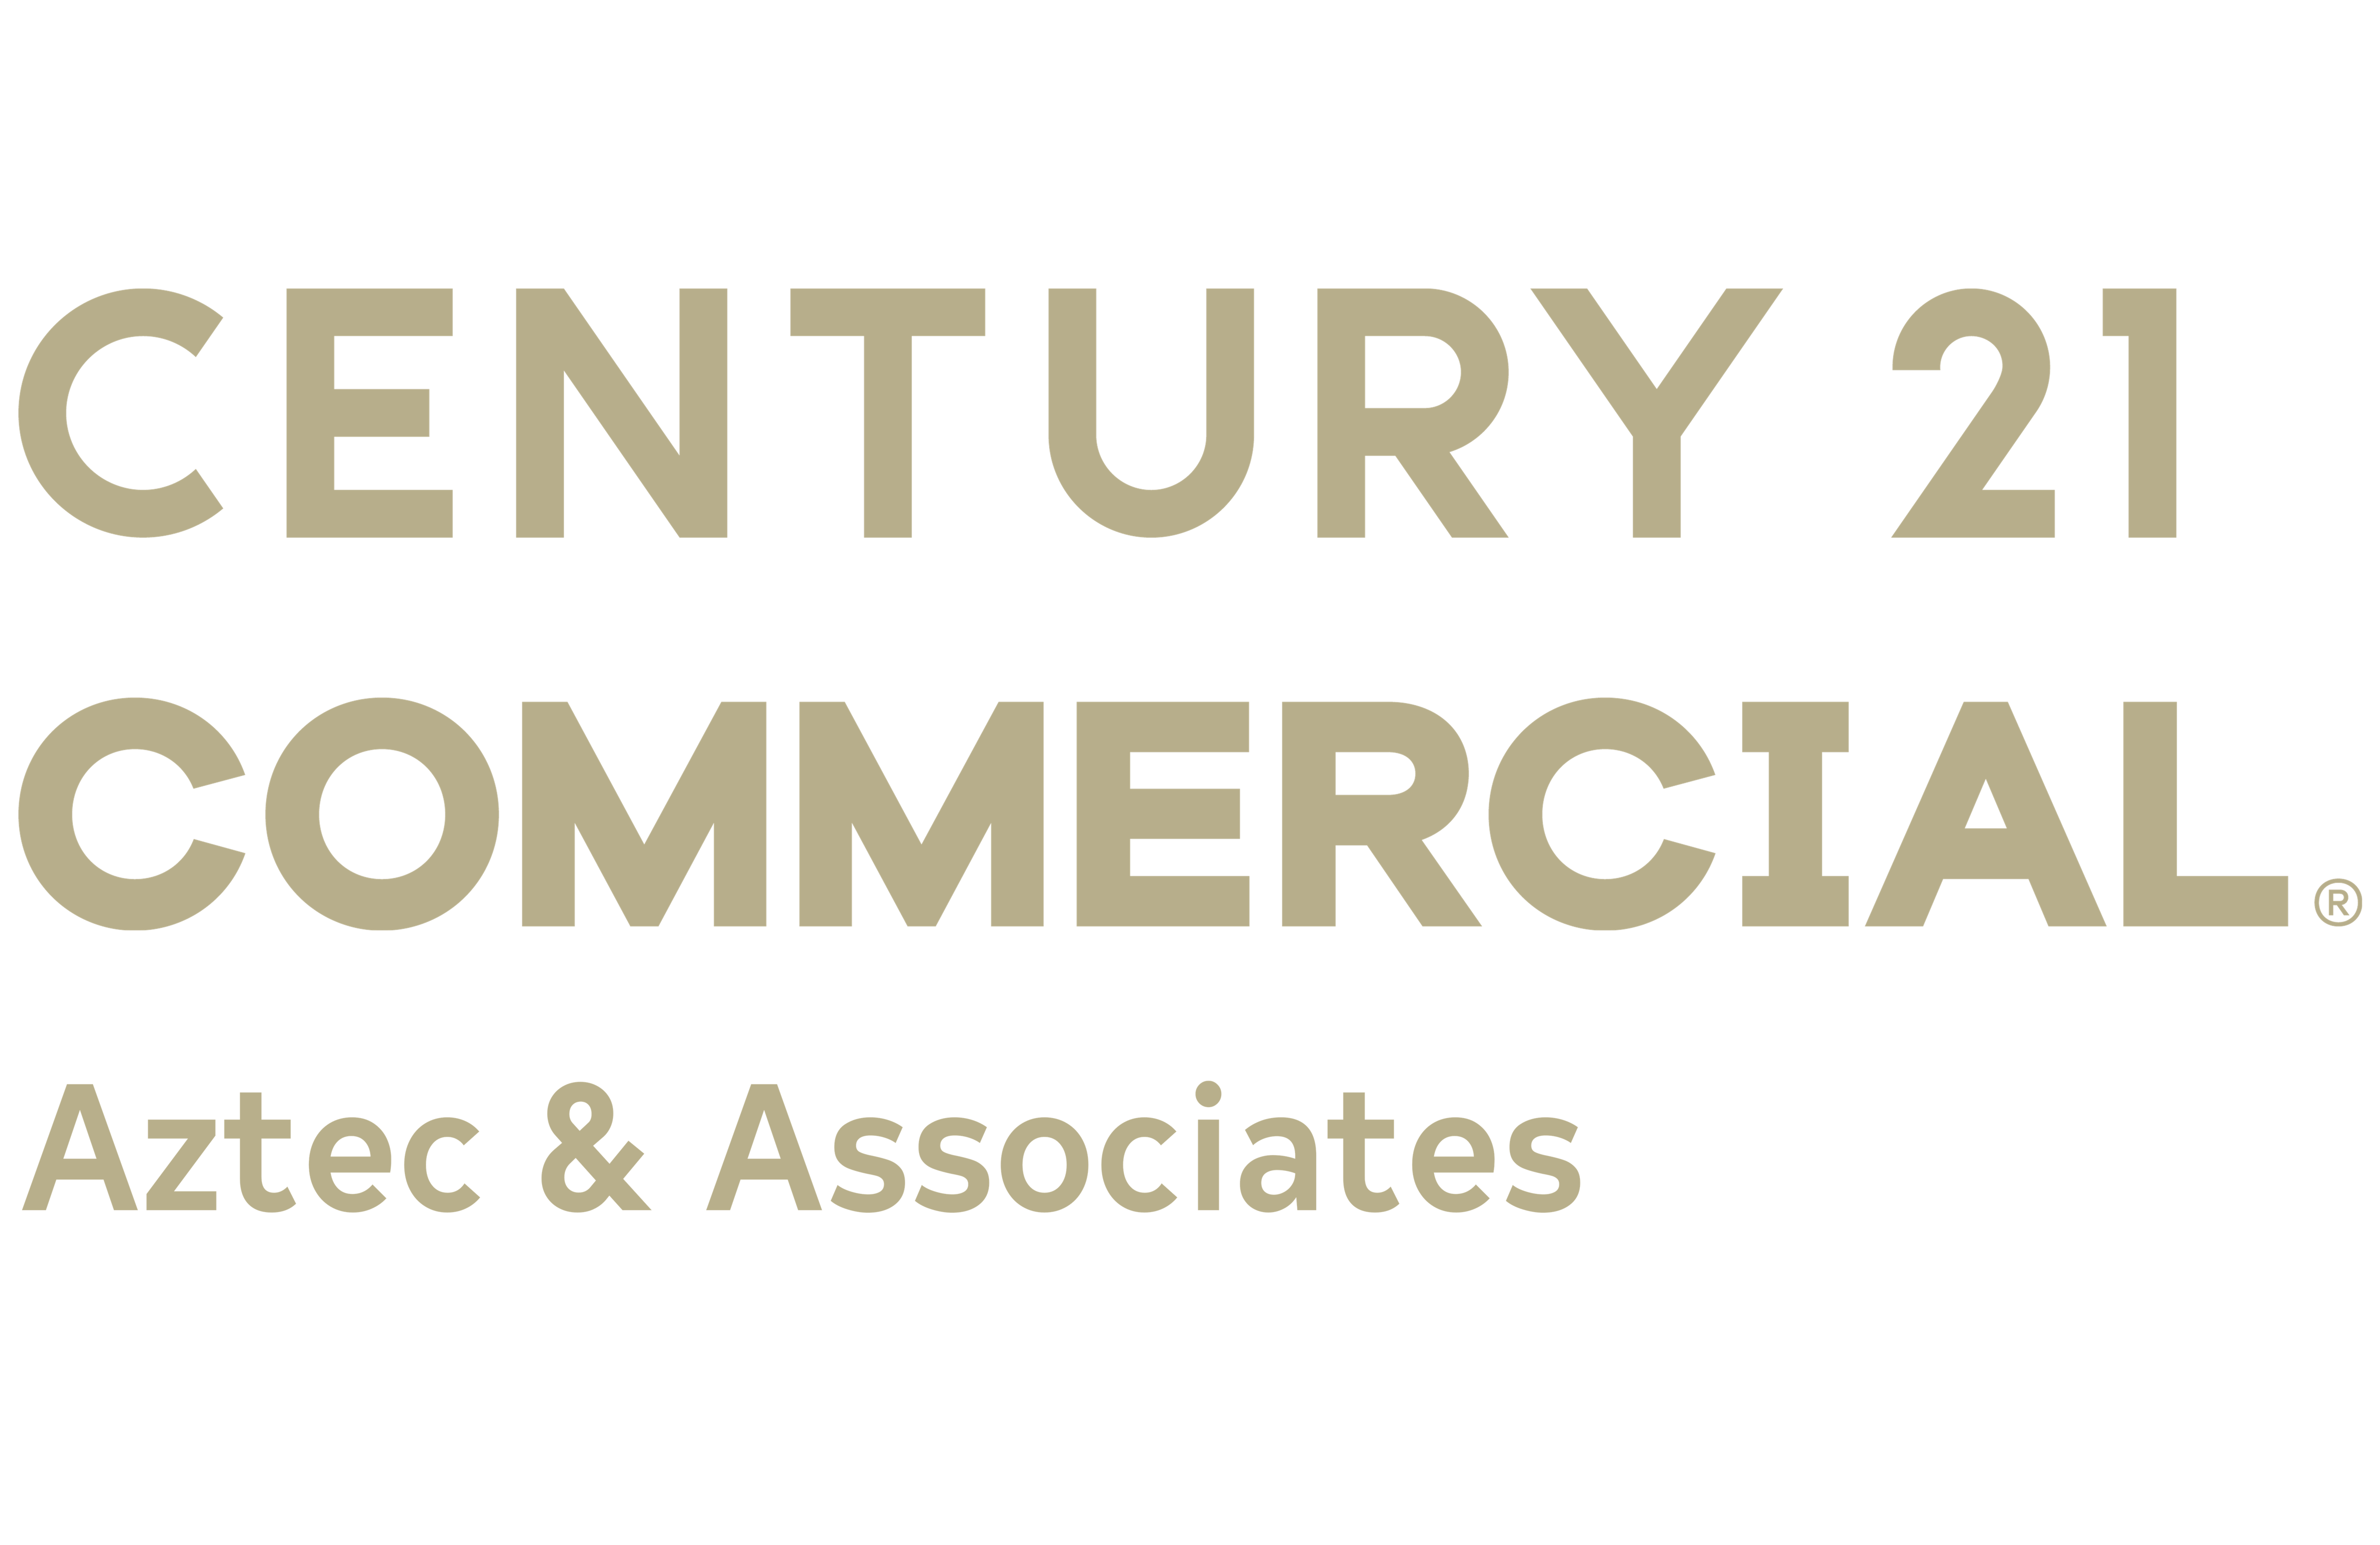 CENTURY 21 Aztec & Associates